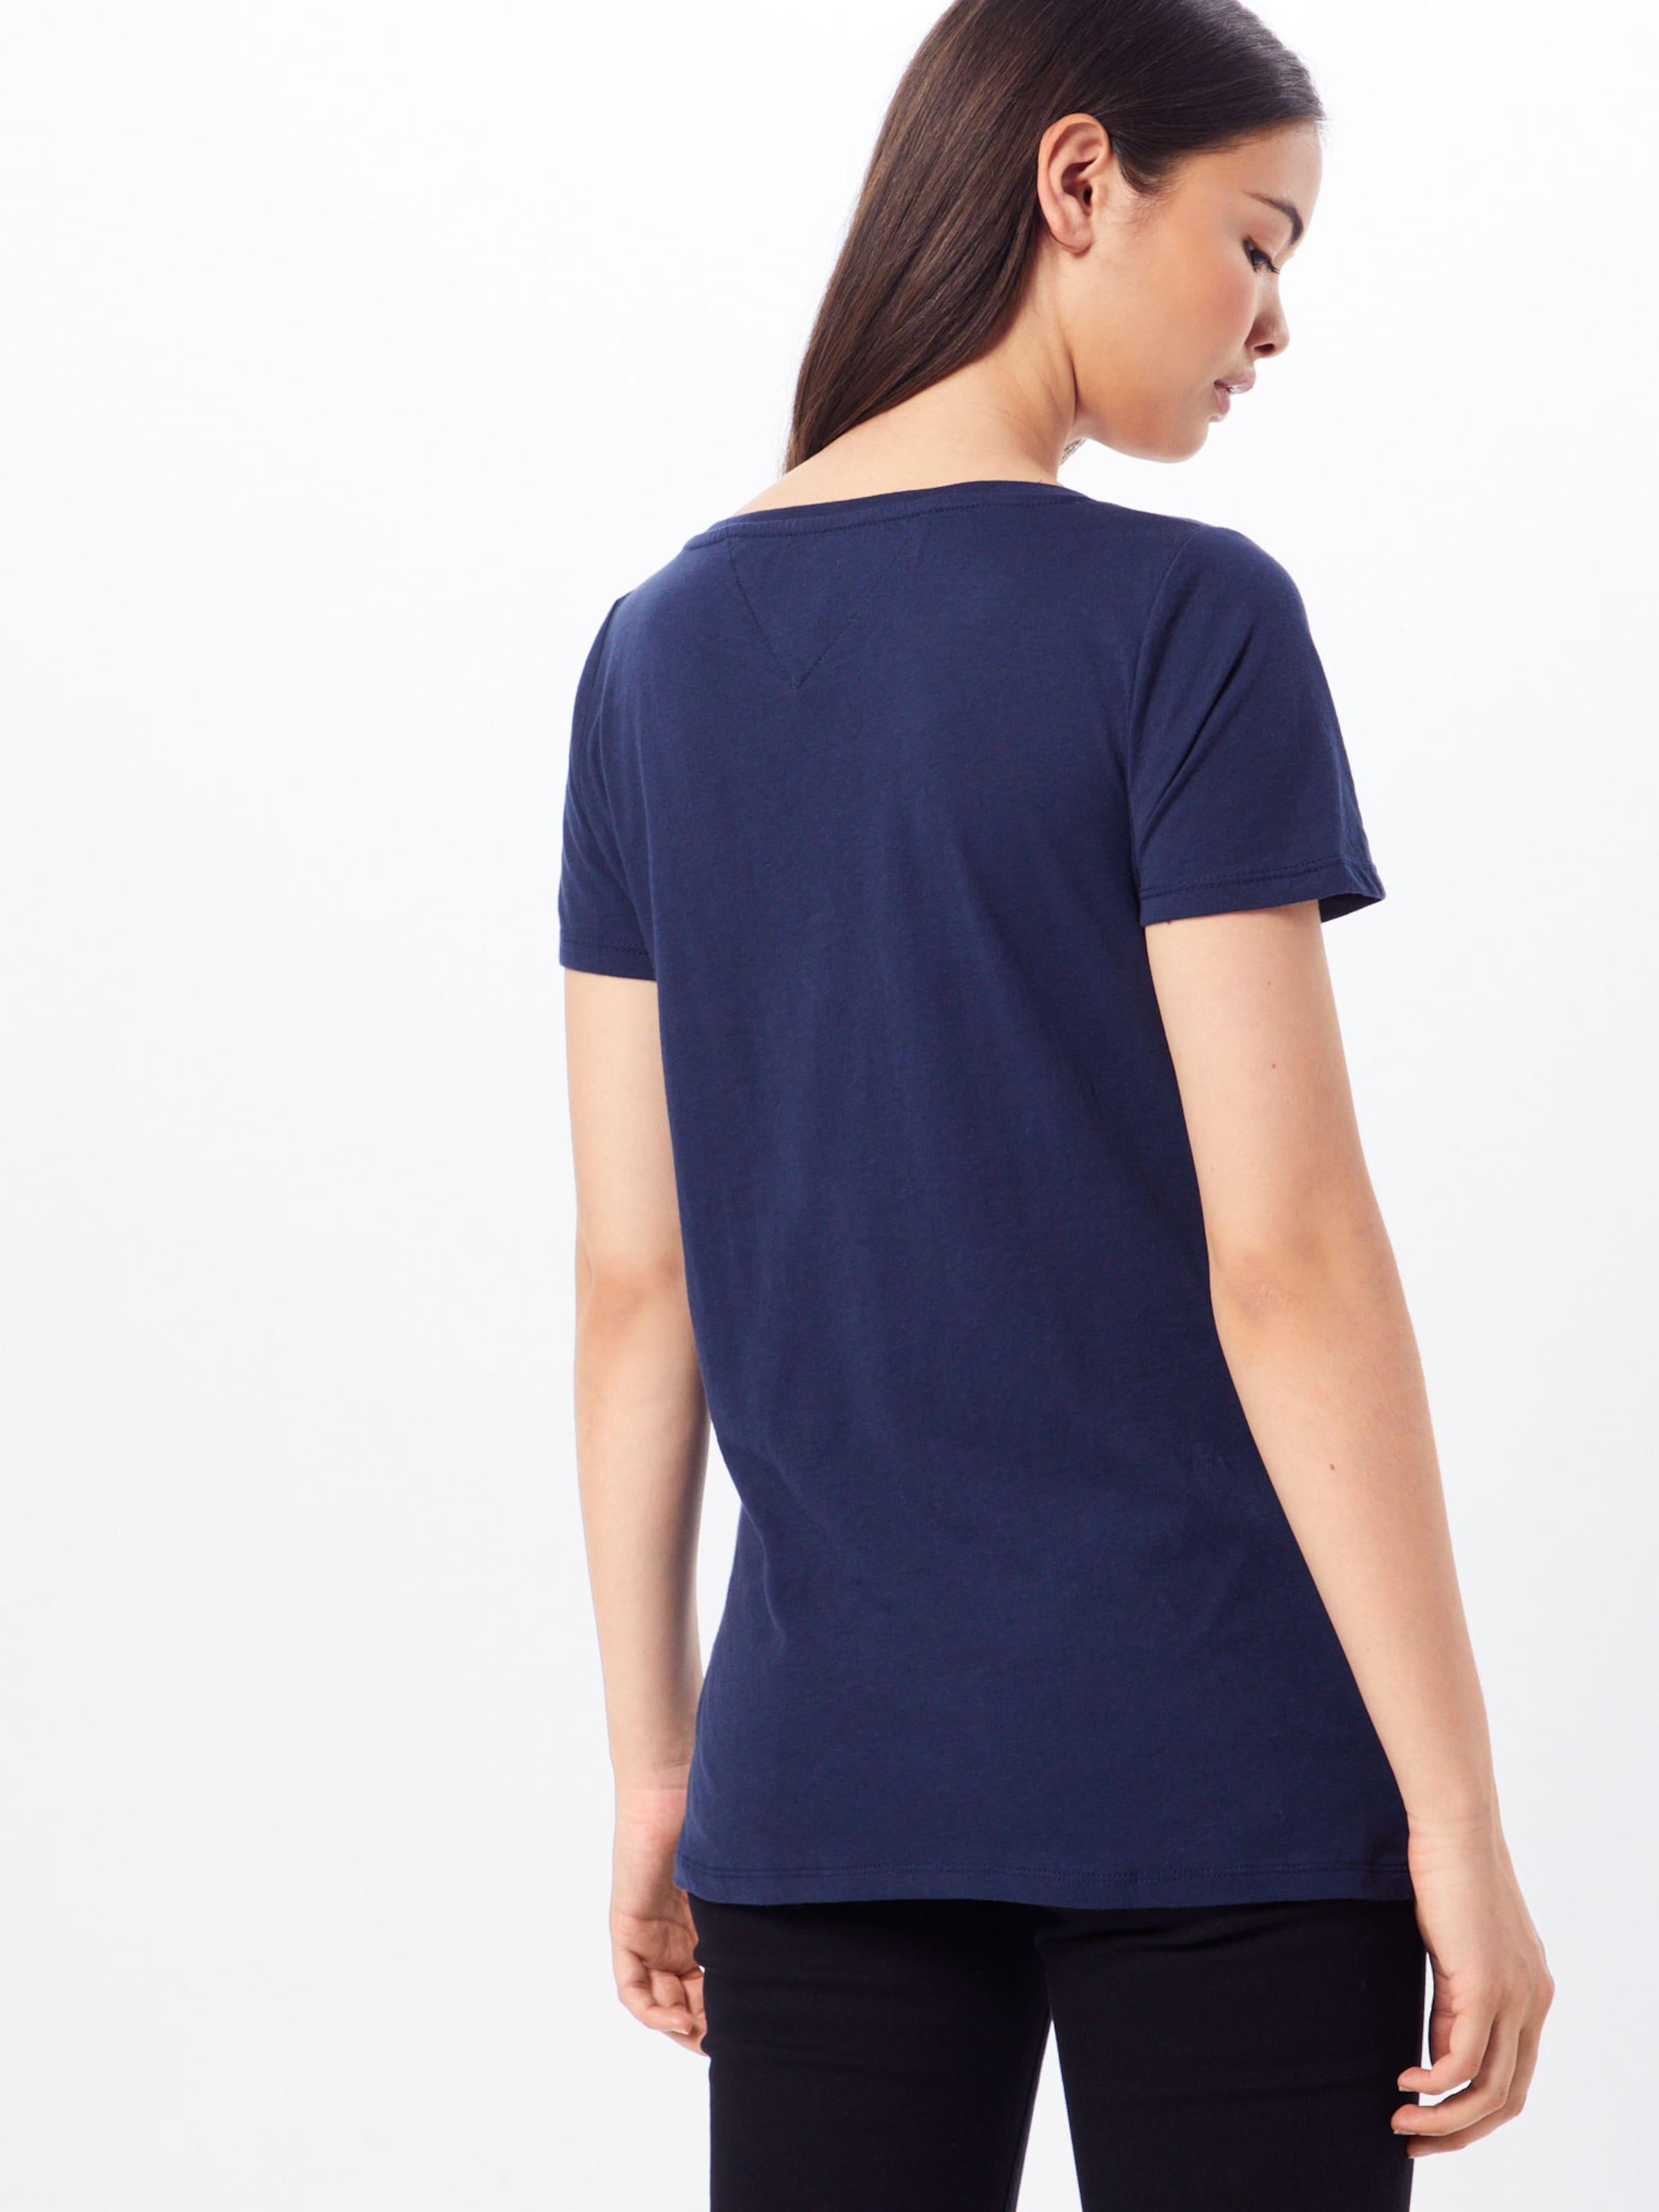 Tommy Jeans Navy In T shirt yvmN0wnO8